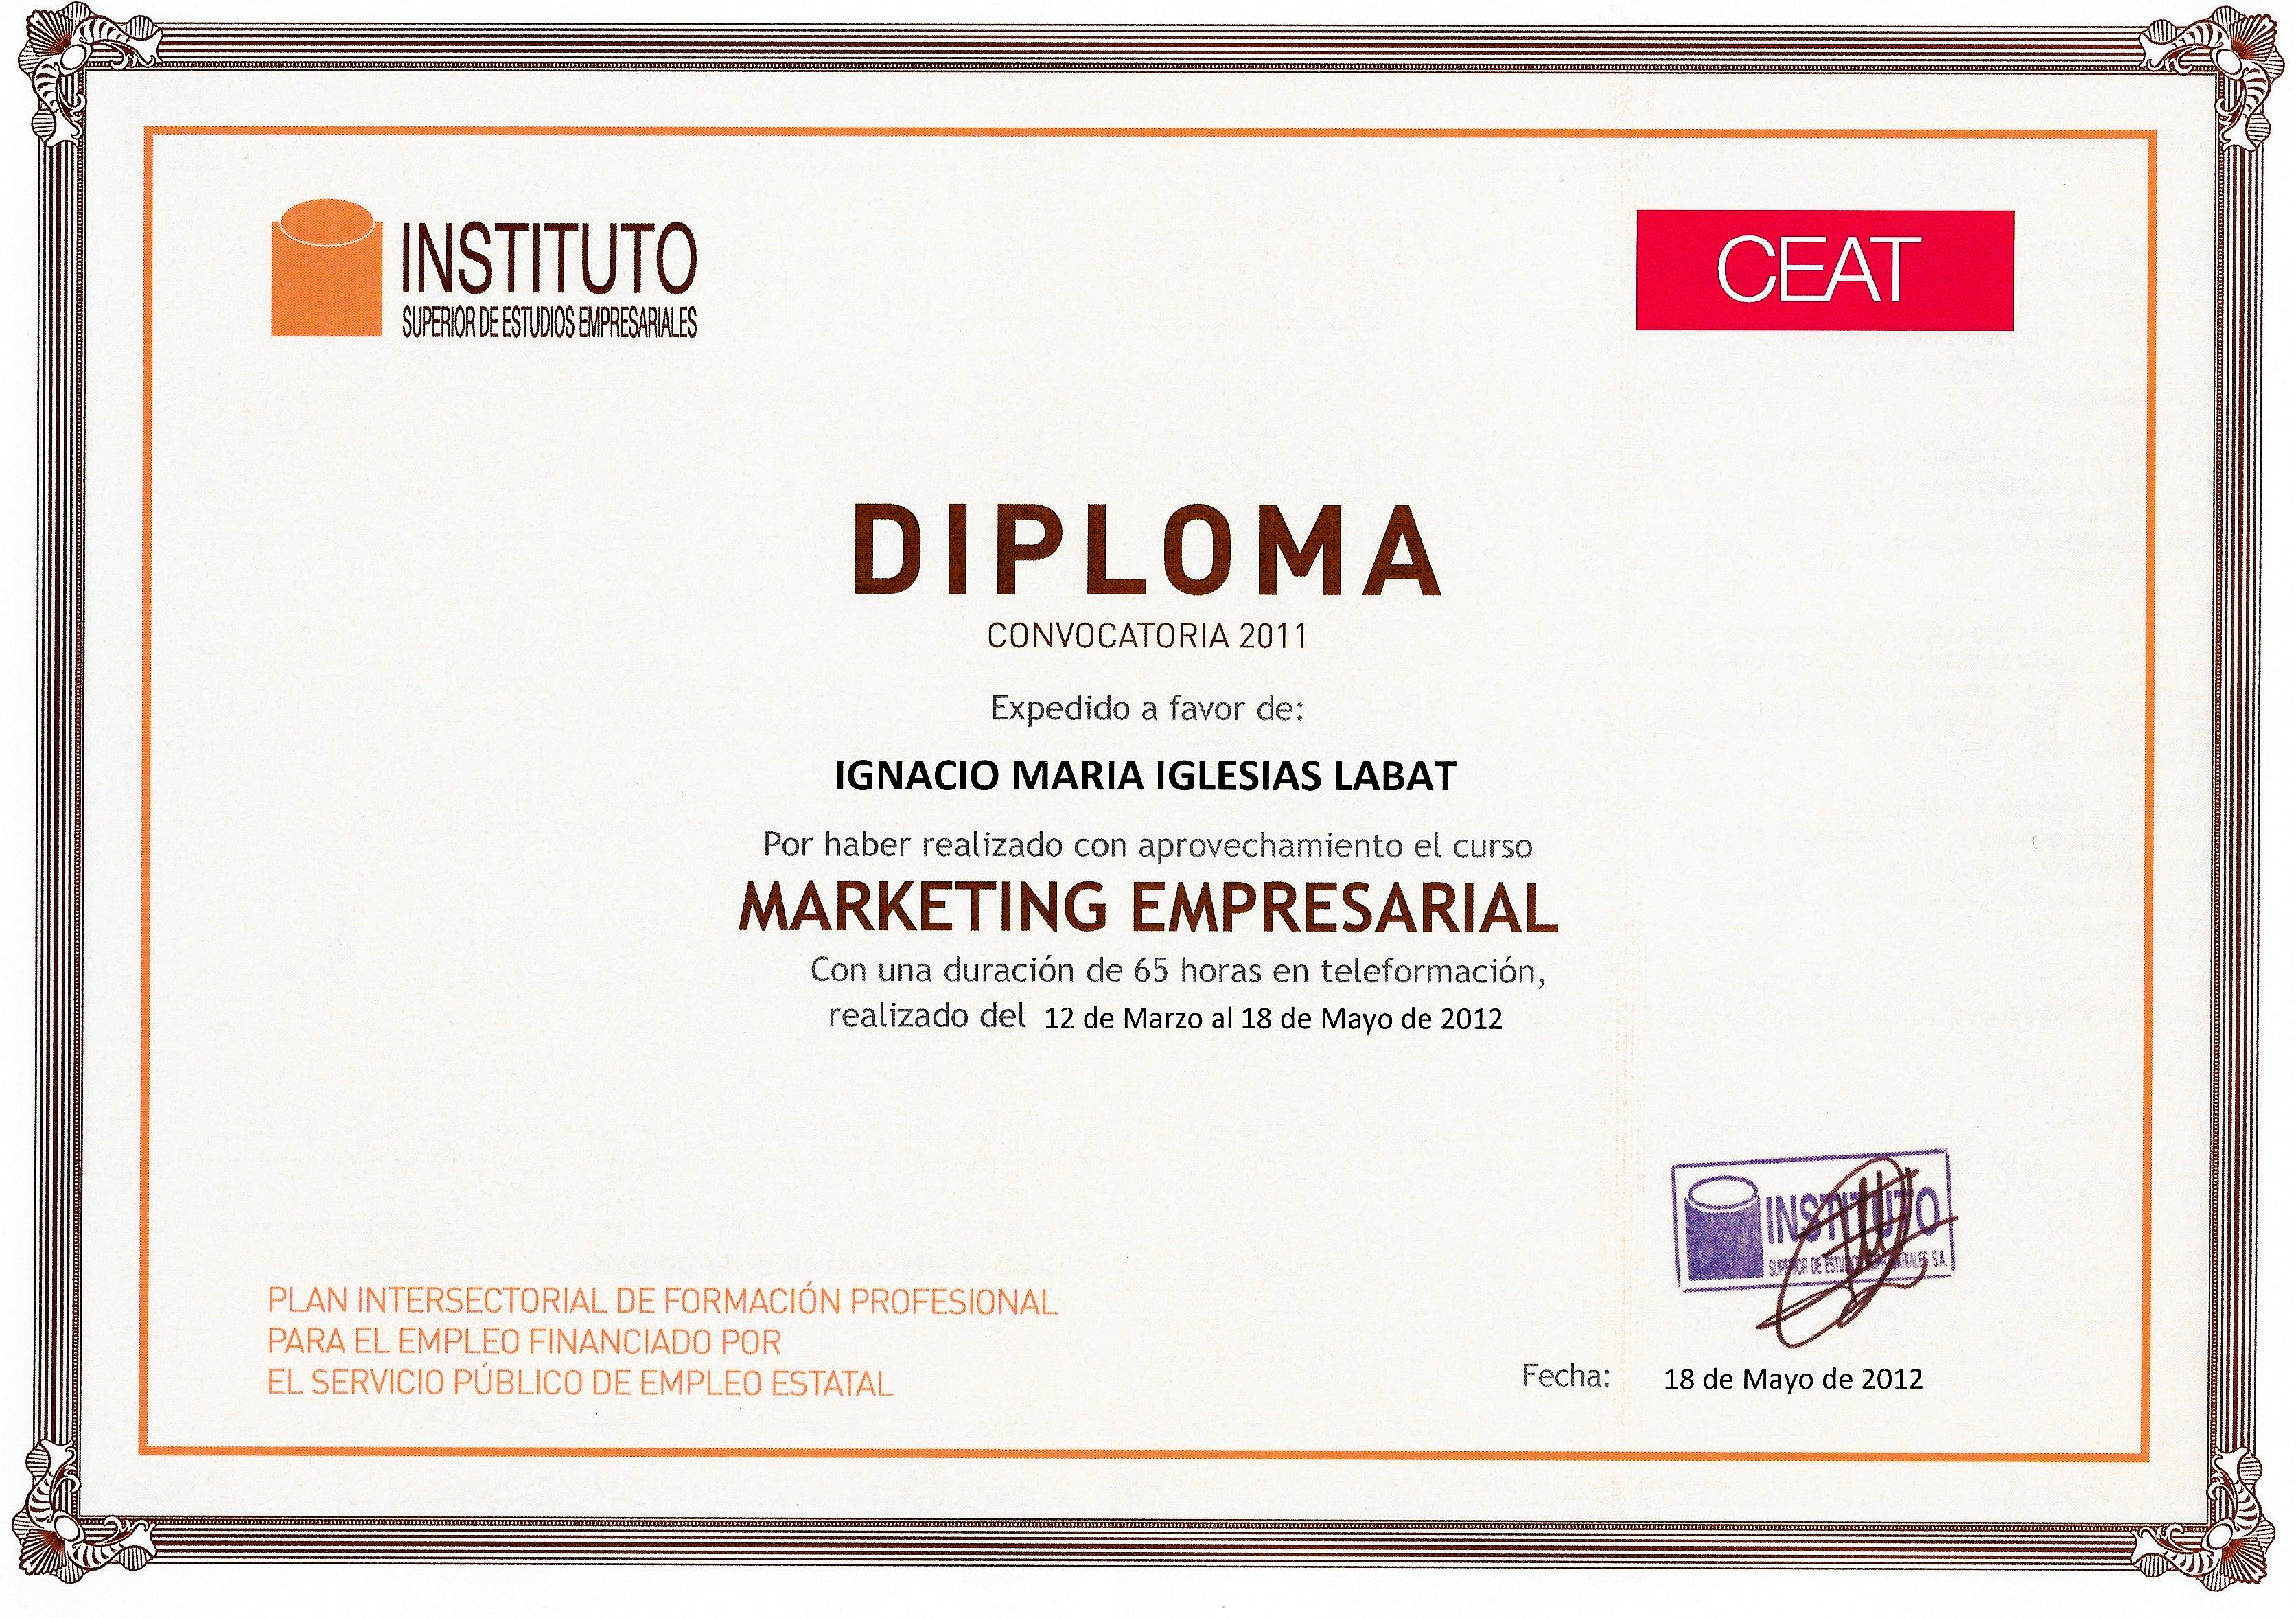 Diploma Margeting Empresarial   INSTITUTO SUPERIOR DE ESTUDIOS EMPRESARIALES